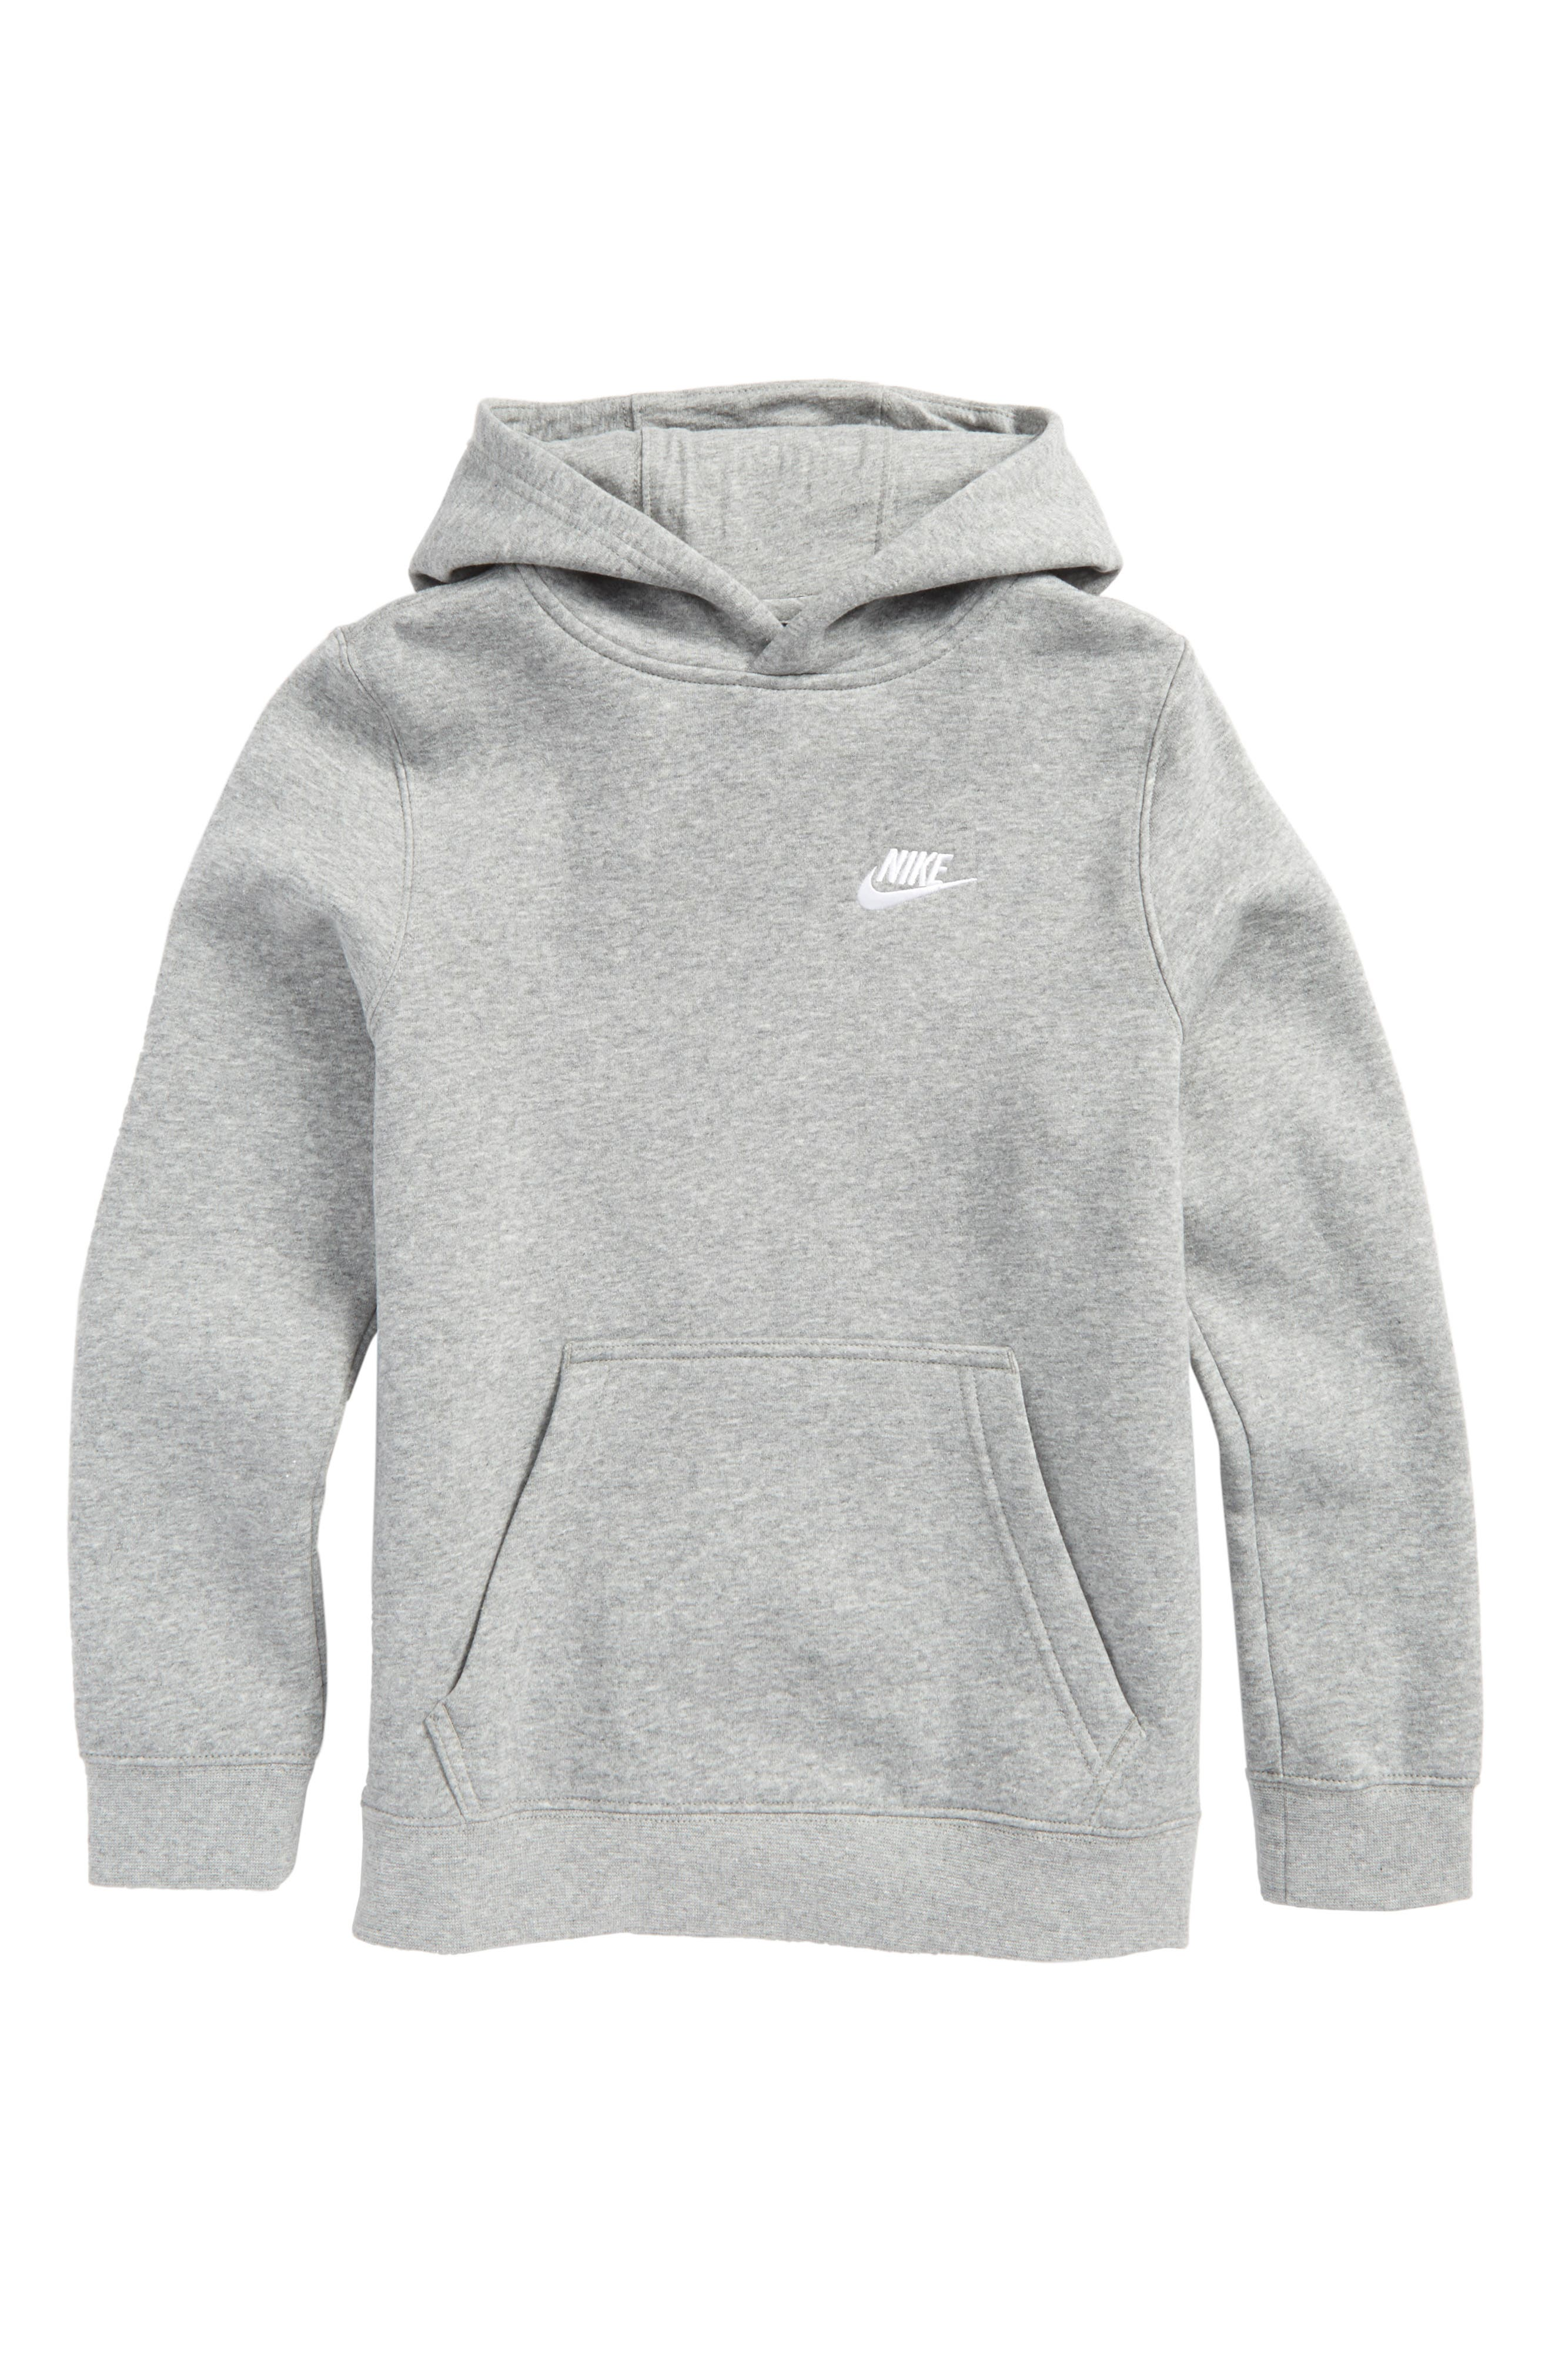 Sportswear Hoodie,                             Main thumbnail 1, color,                             Dark Grey Heather/ White